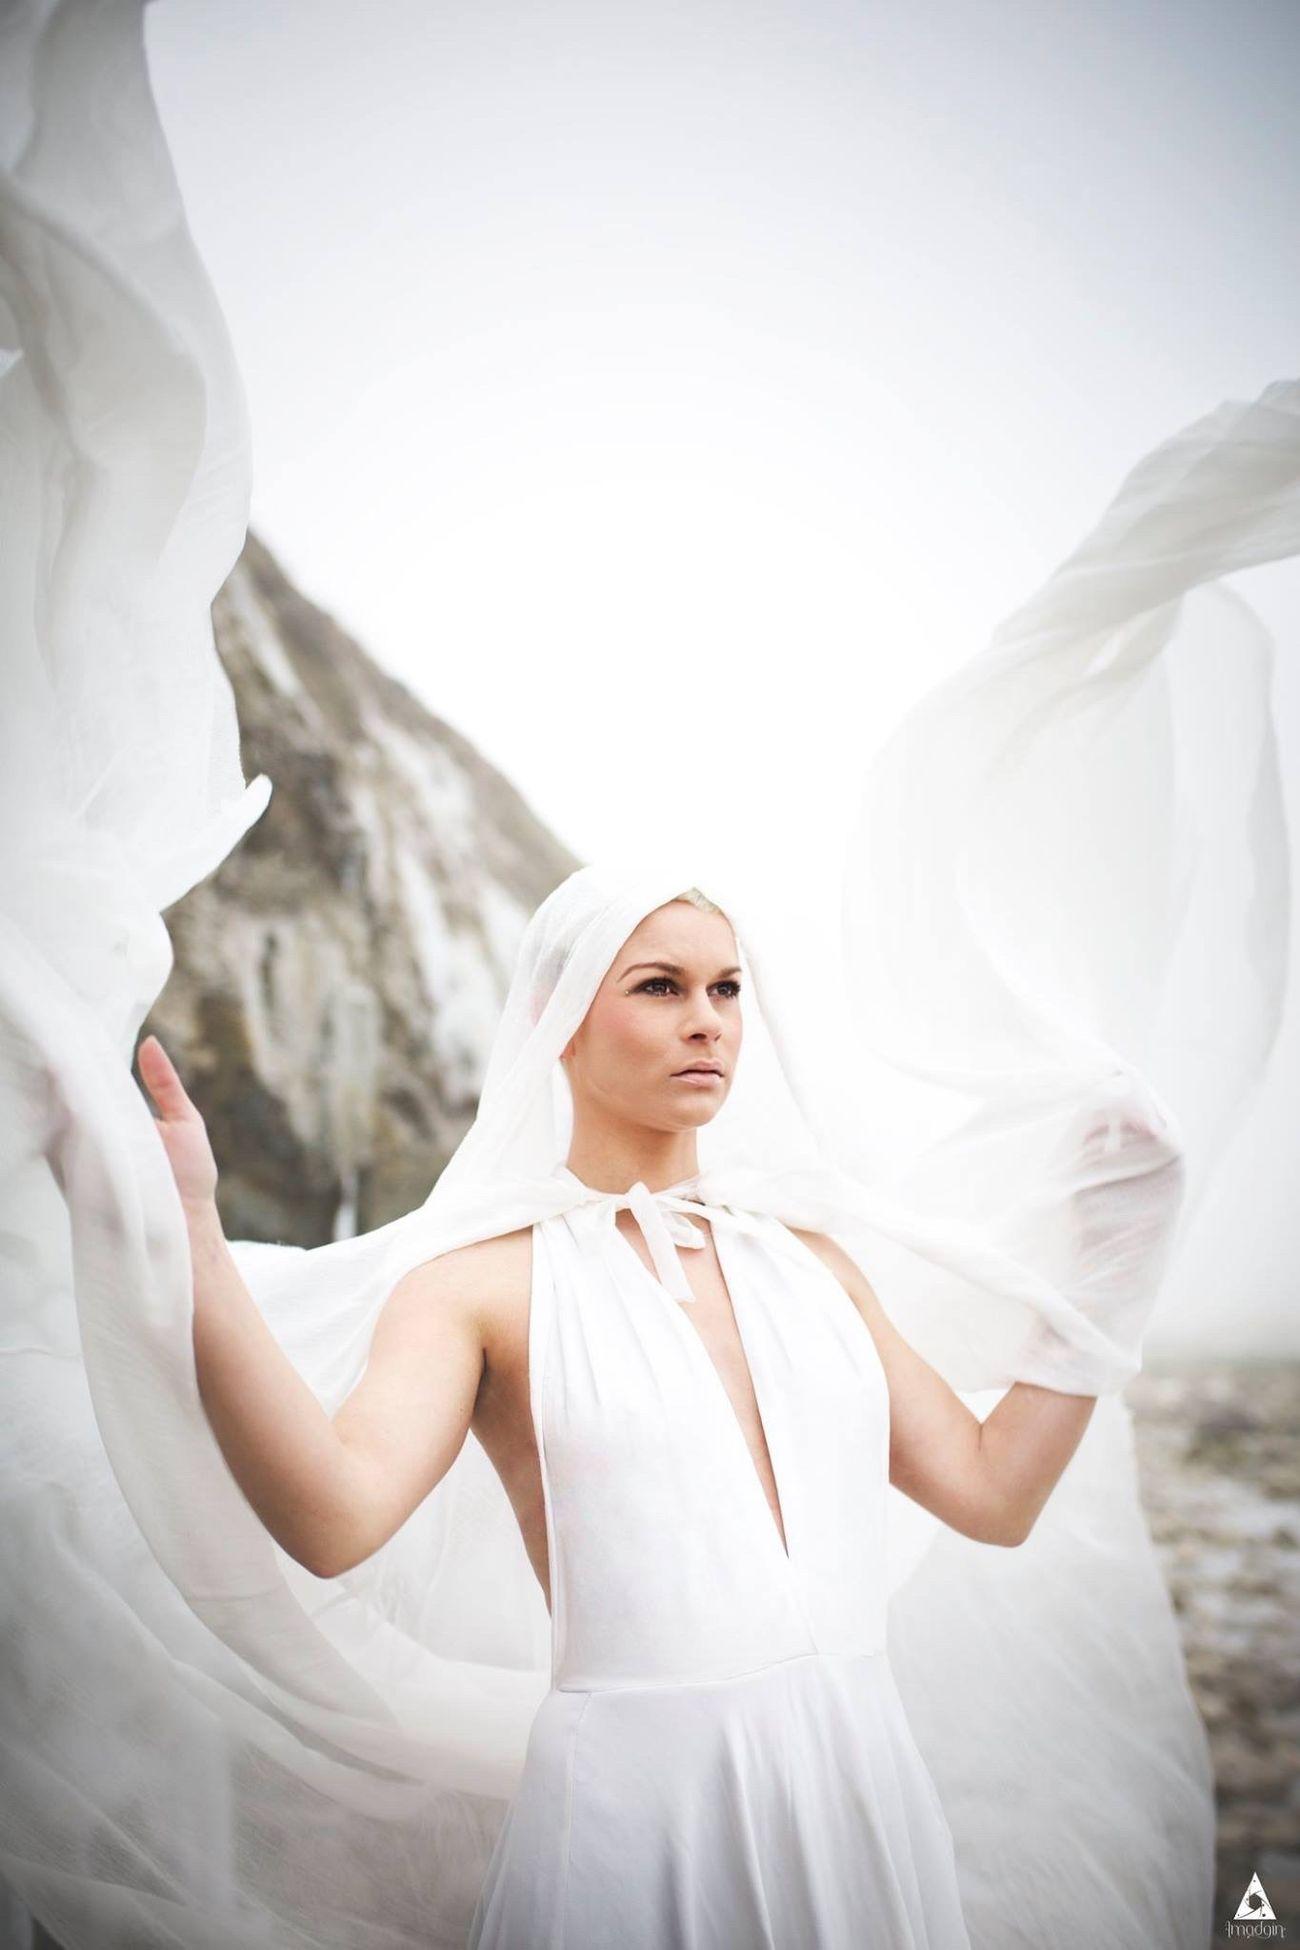 Lady Cold ❄️ Women Ice Winter Wind Beach Sea Photography Model Lady